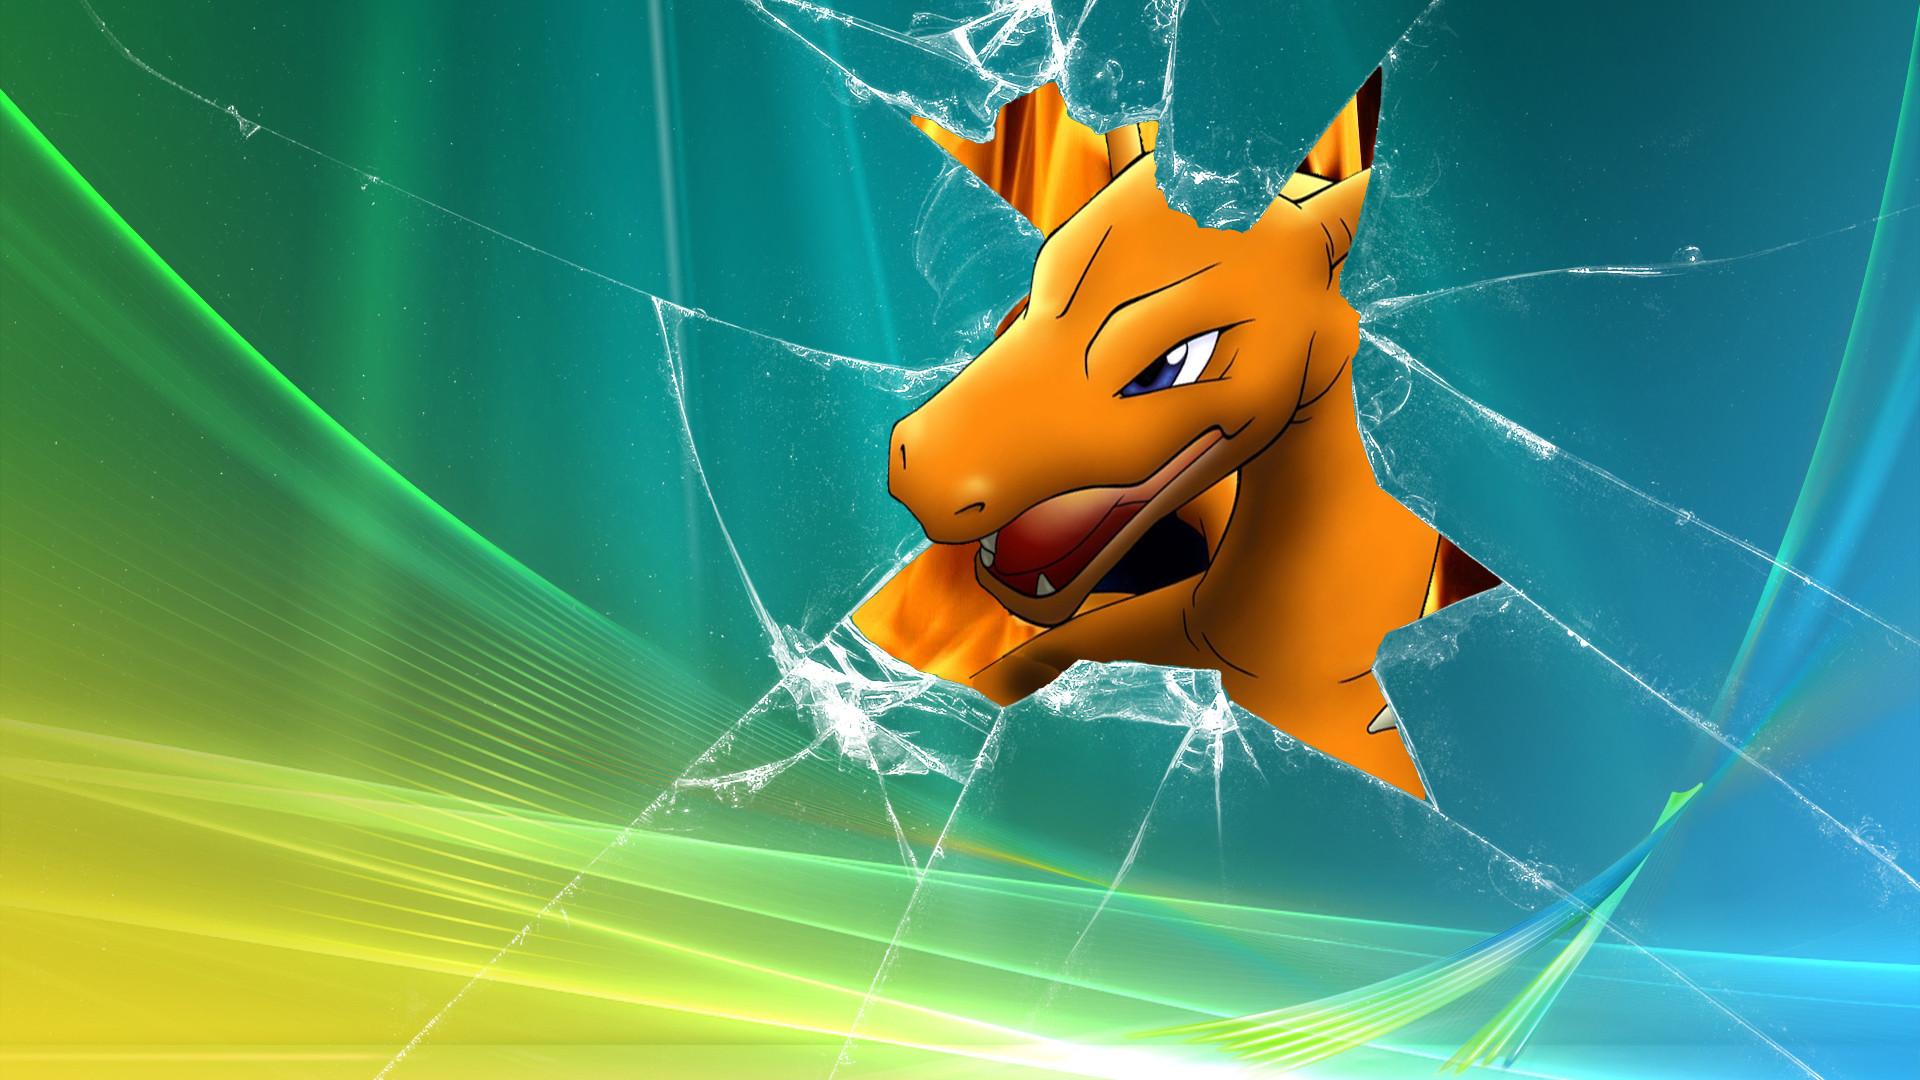 Pokemon, broken screen, Windows Vista, Charizard – Free Wallpaper /  WallpaperJam.com